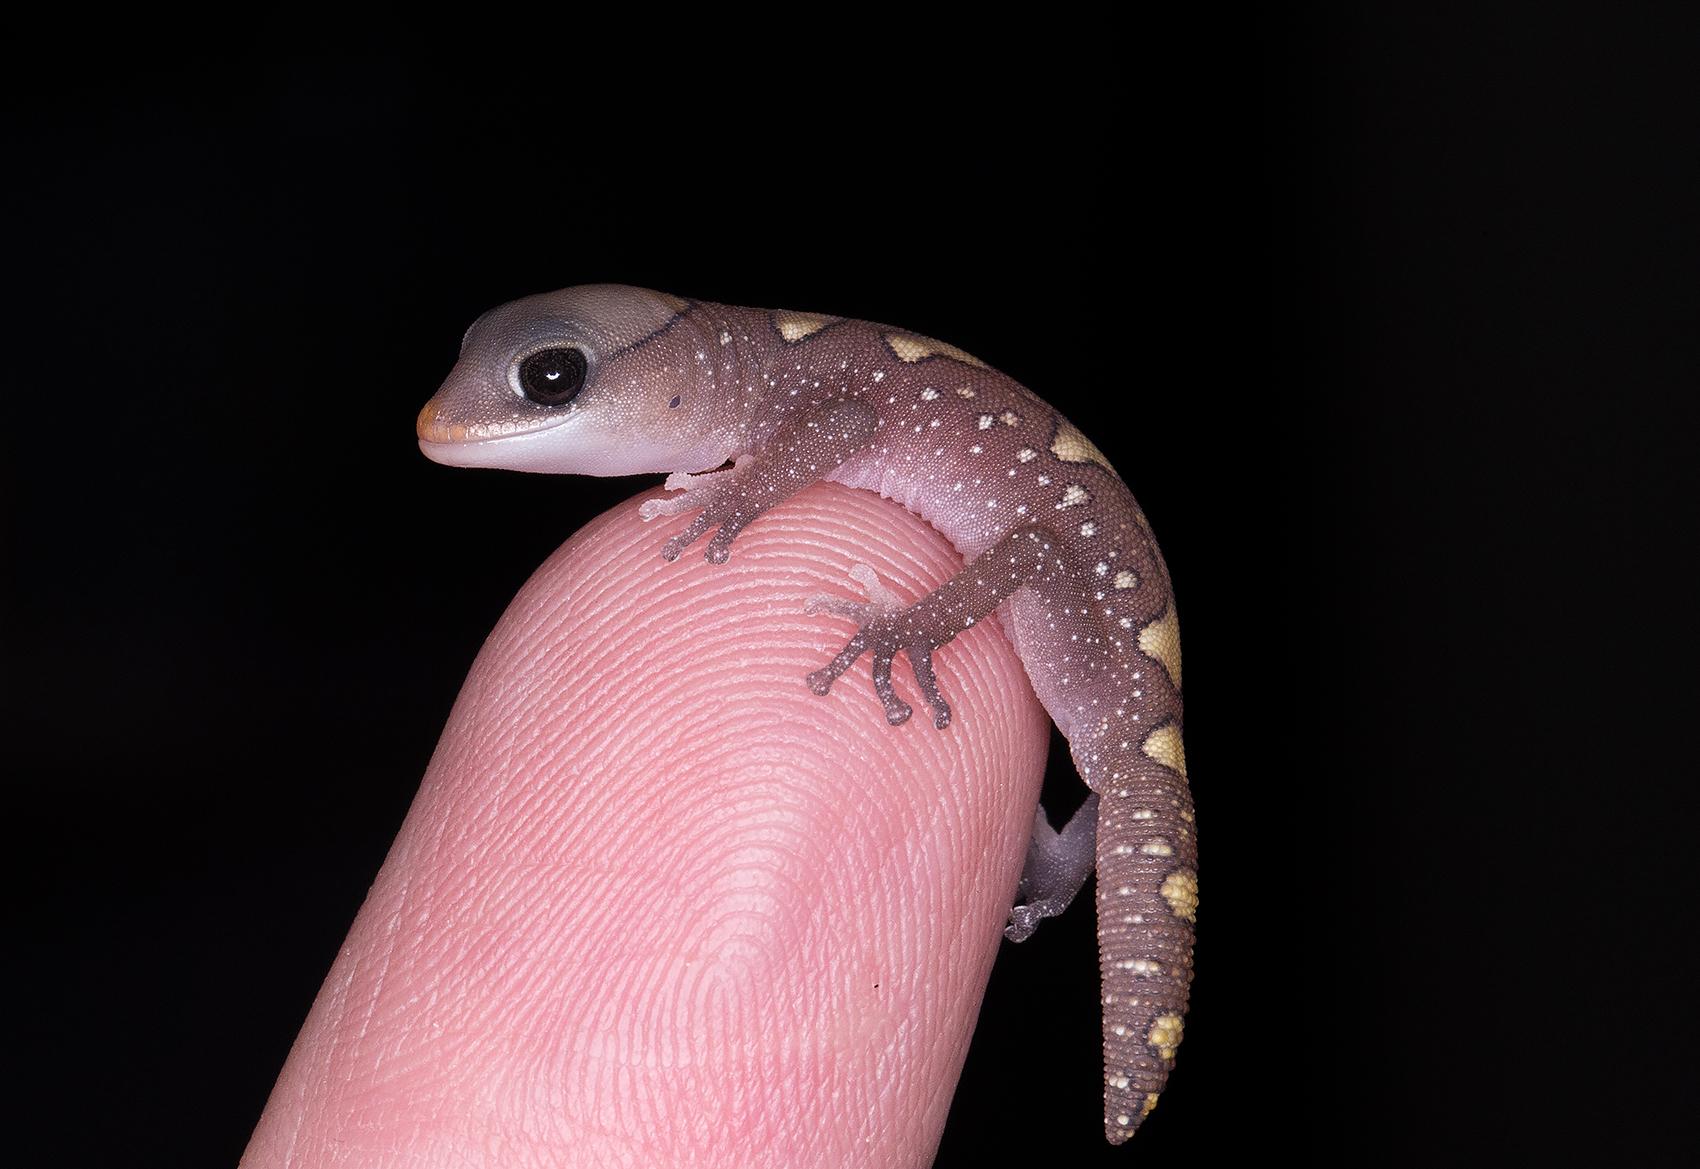 Hatchling Diplodactylus galeatus